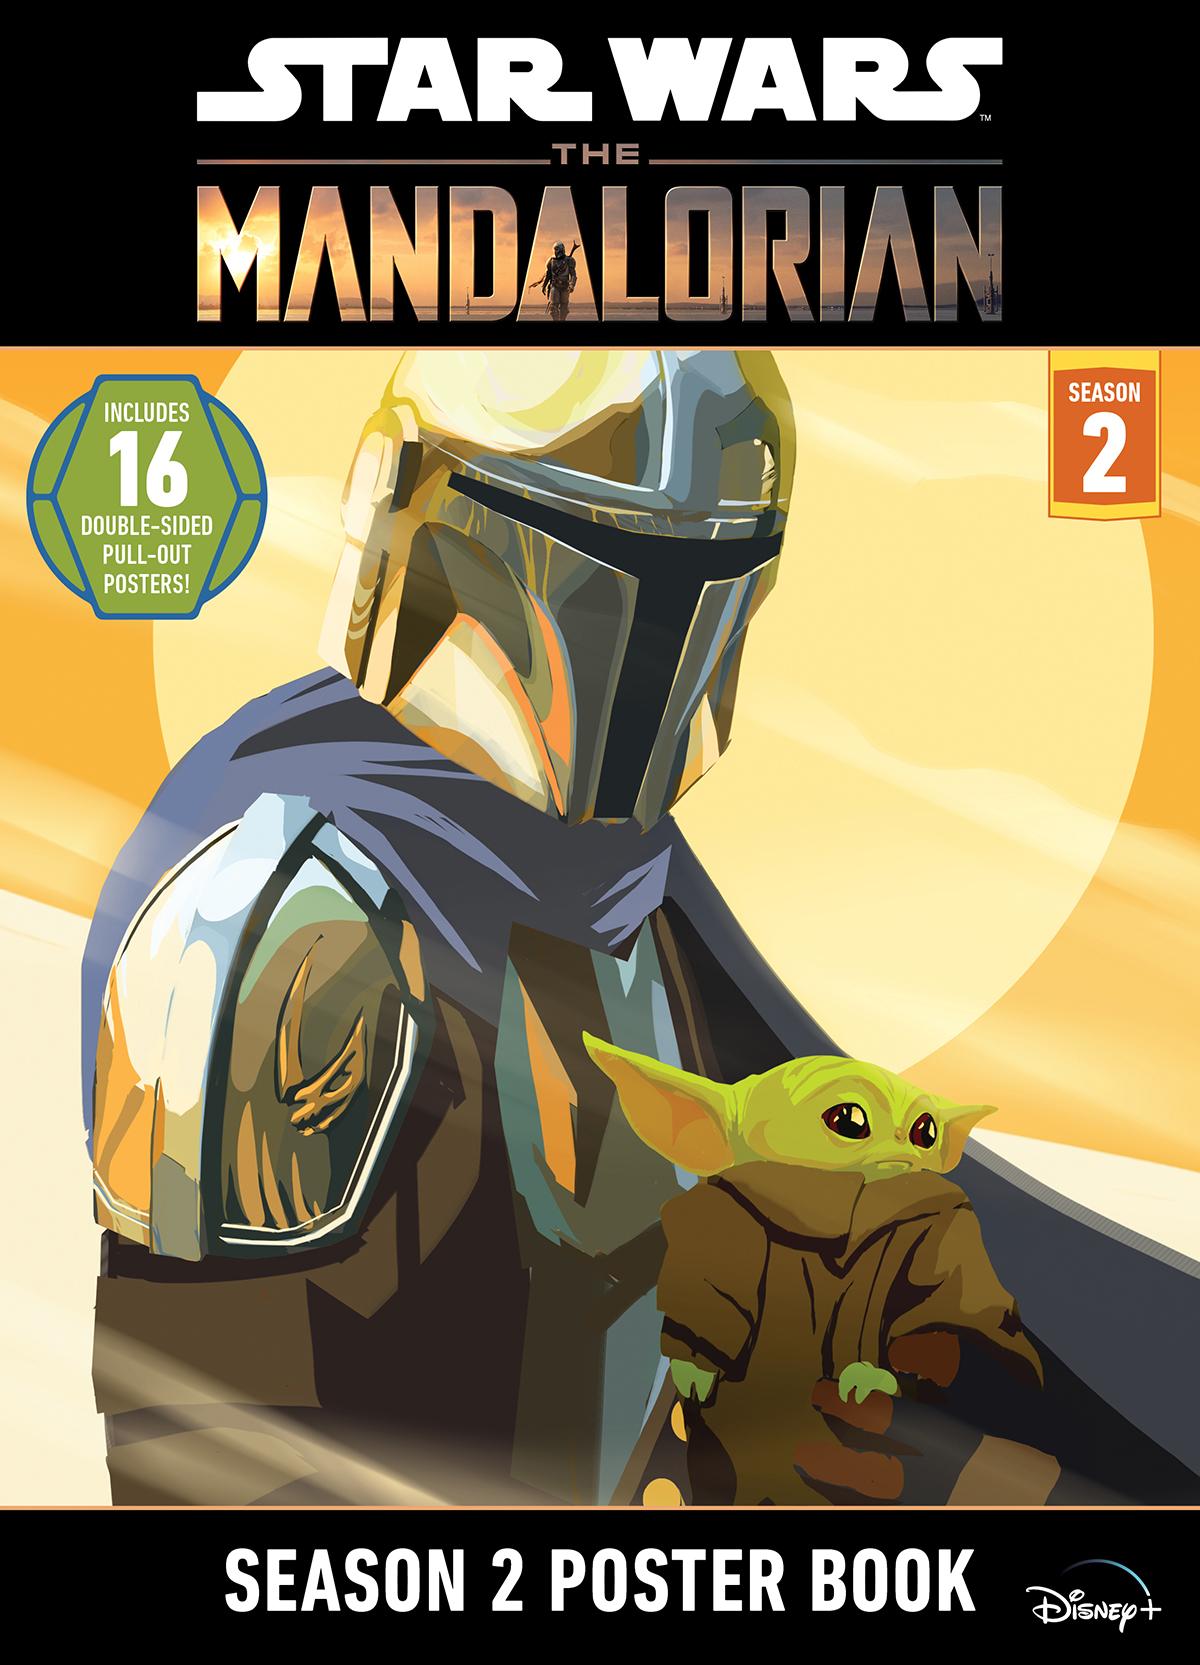 Star Wars: The Mandalorian Season 2 Poster Book